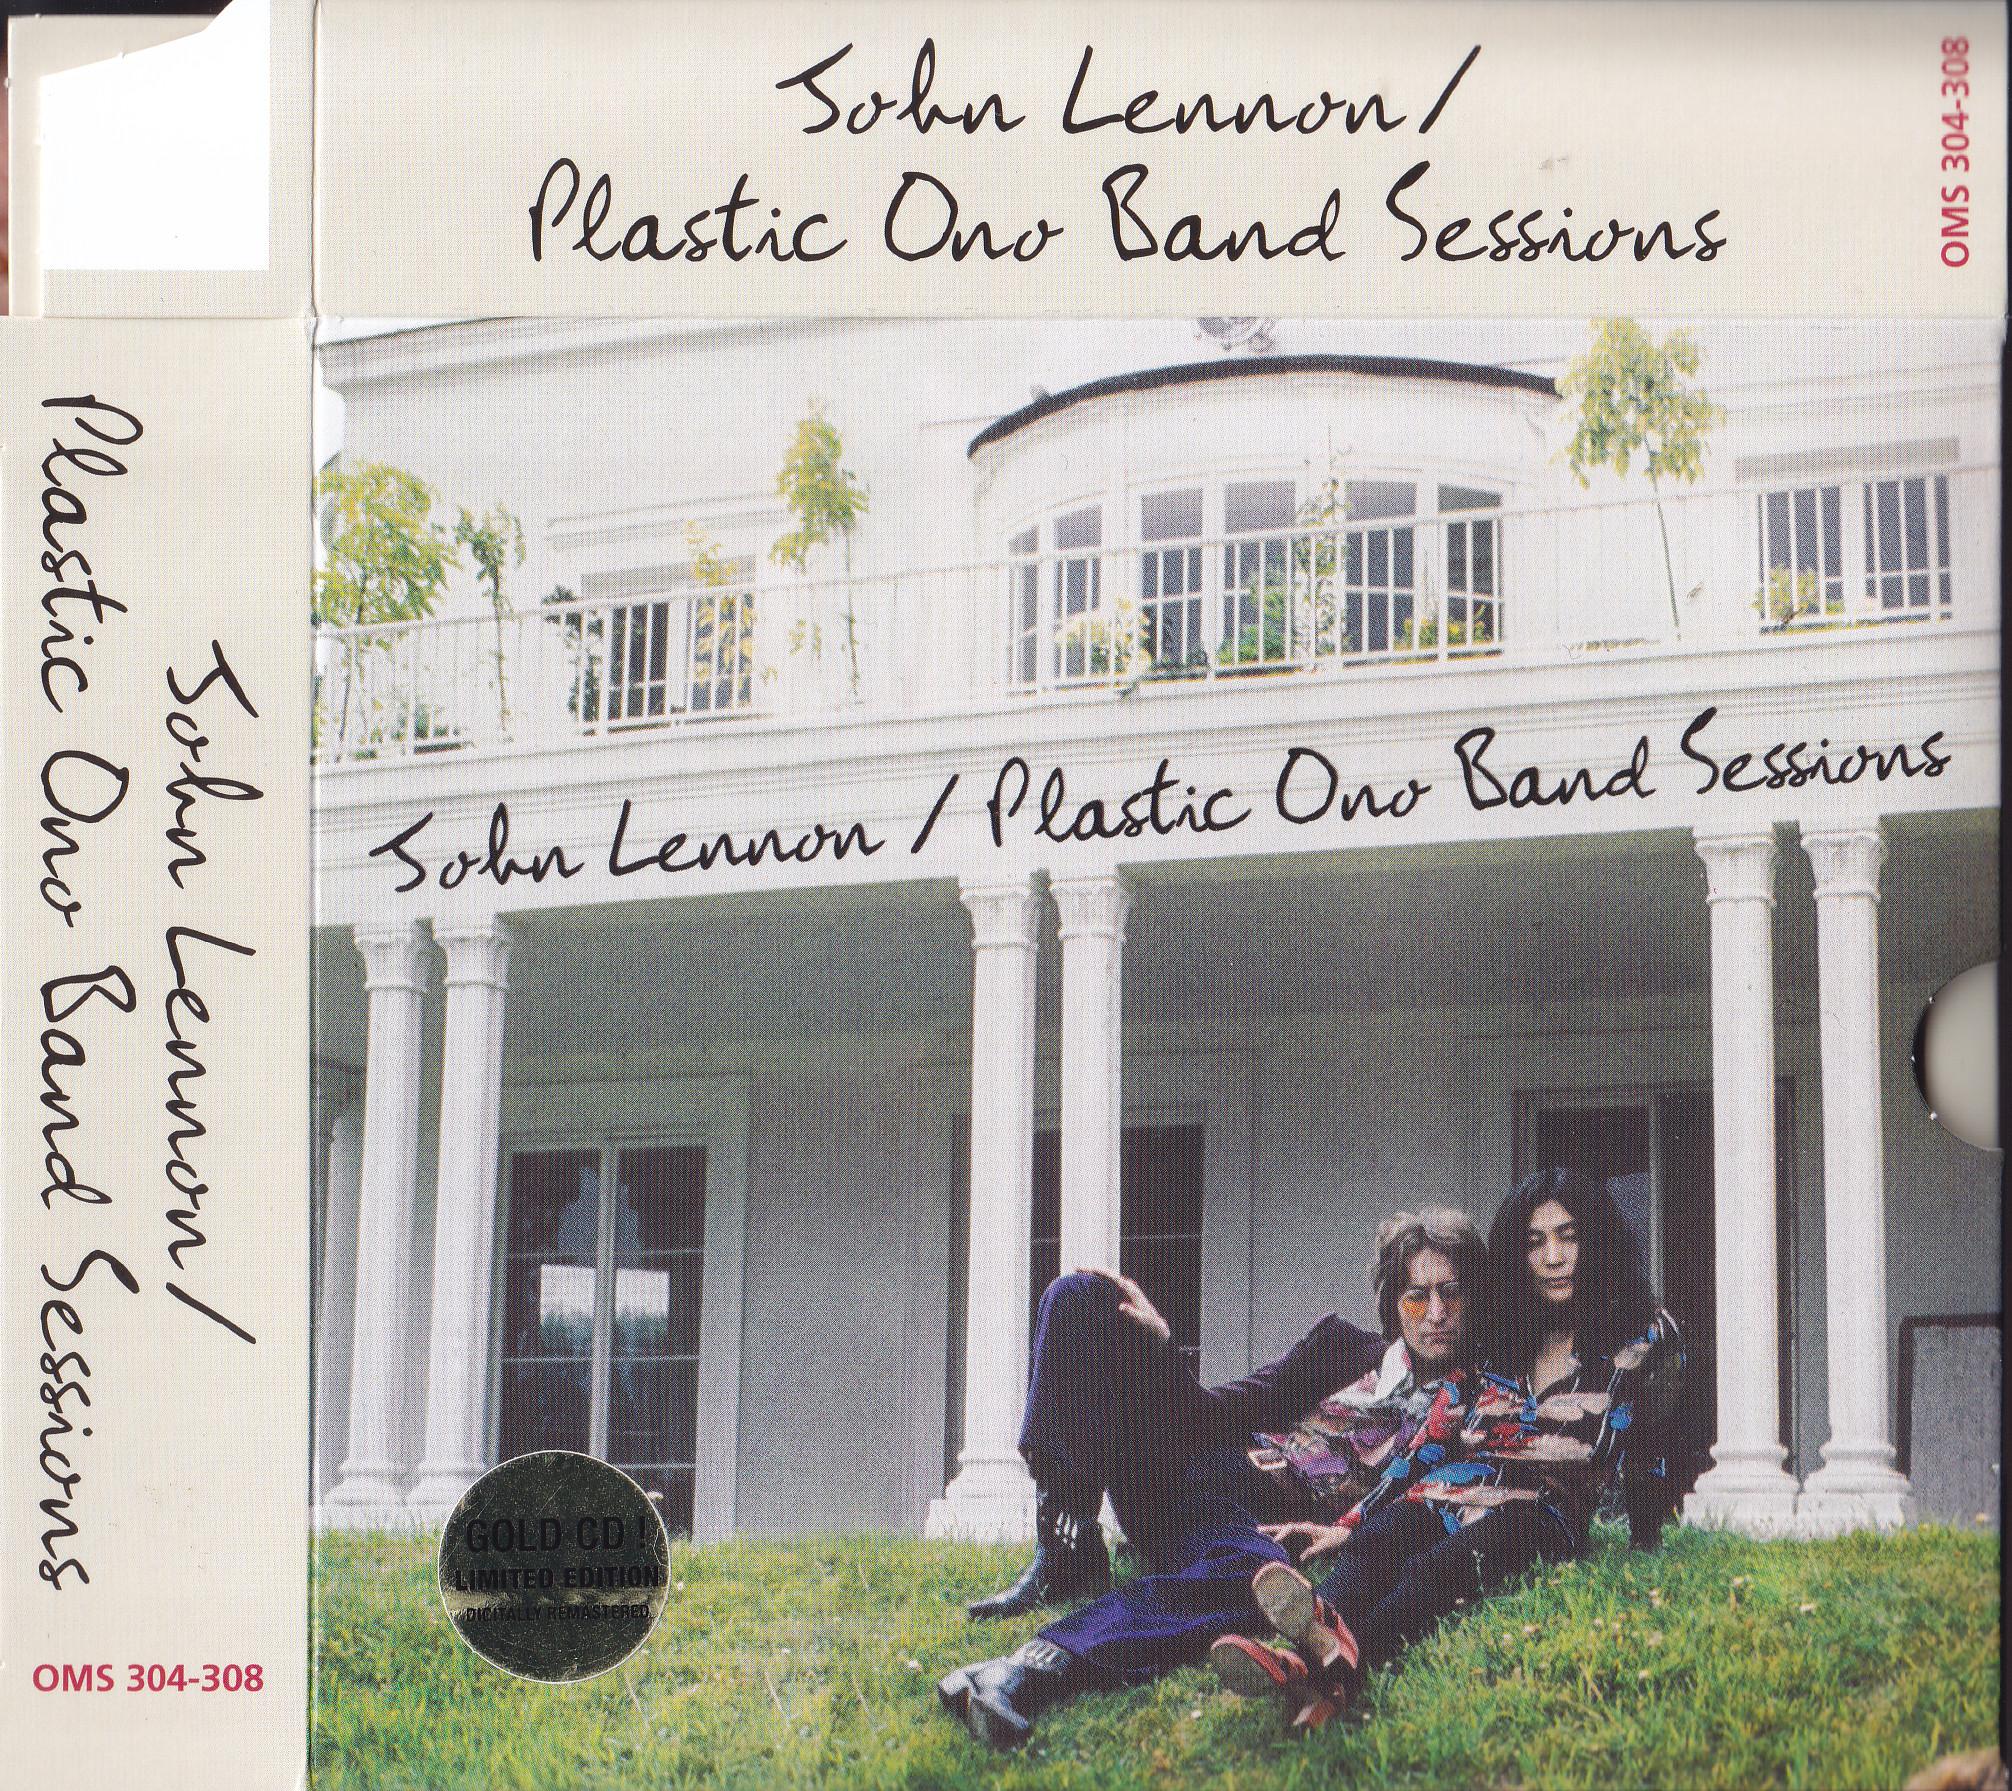 John John John John Lennon Lennon Lennon Lennon John rPrqx6v